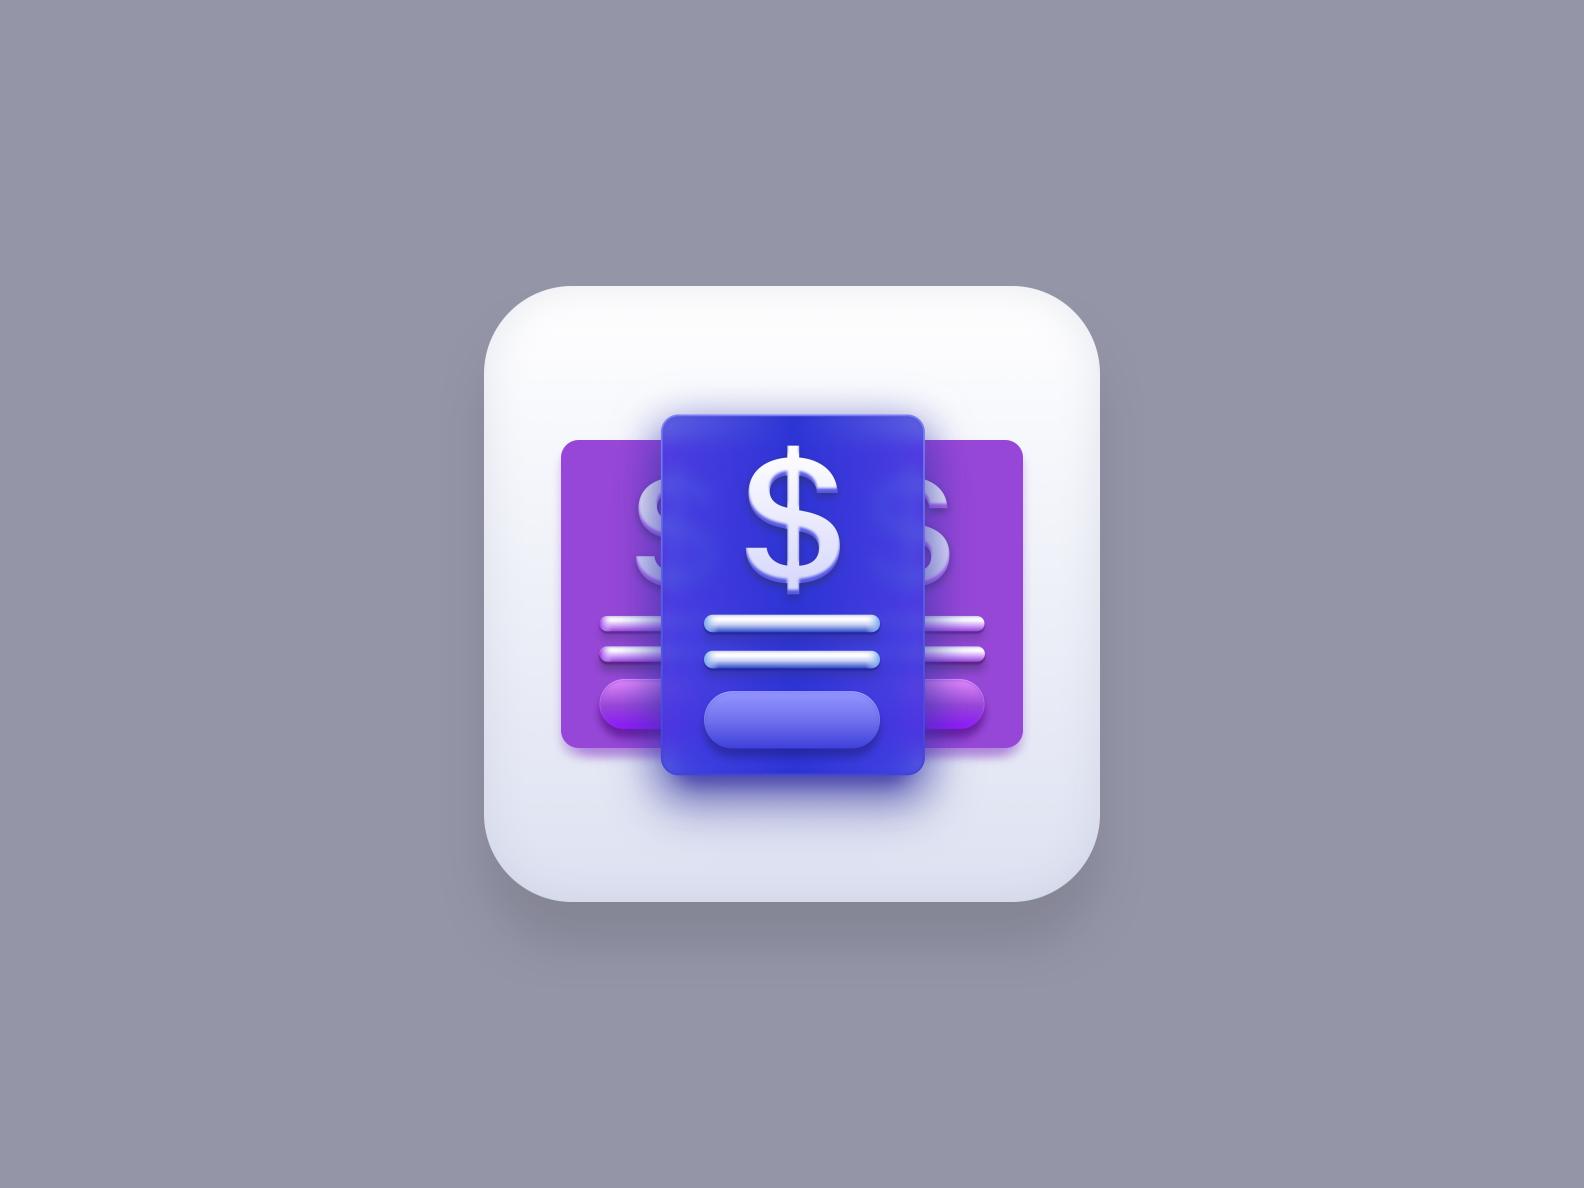 Price List icon (Big Sur)